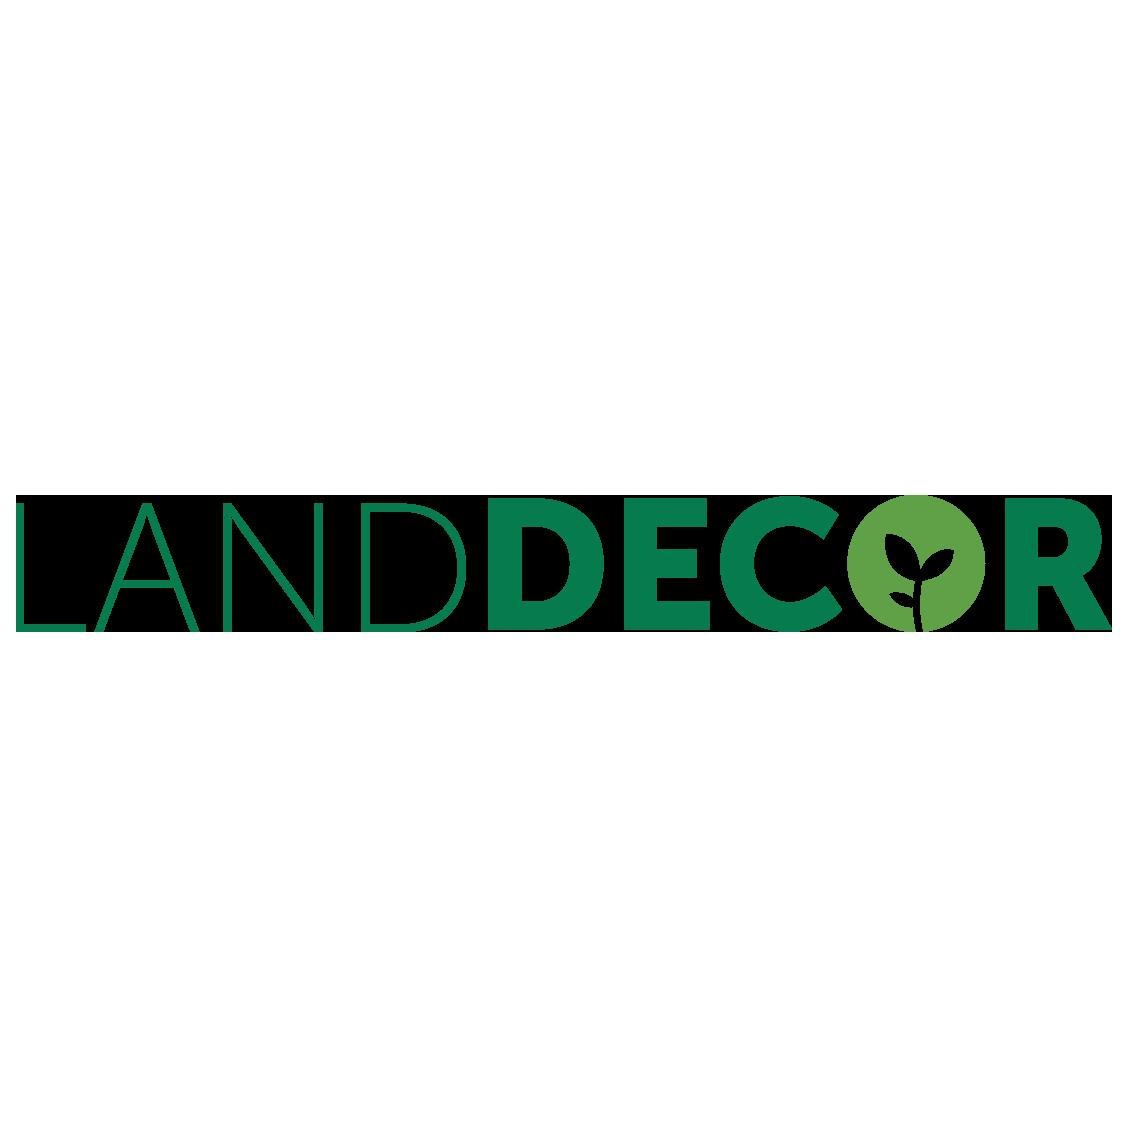 Land Decor